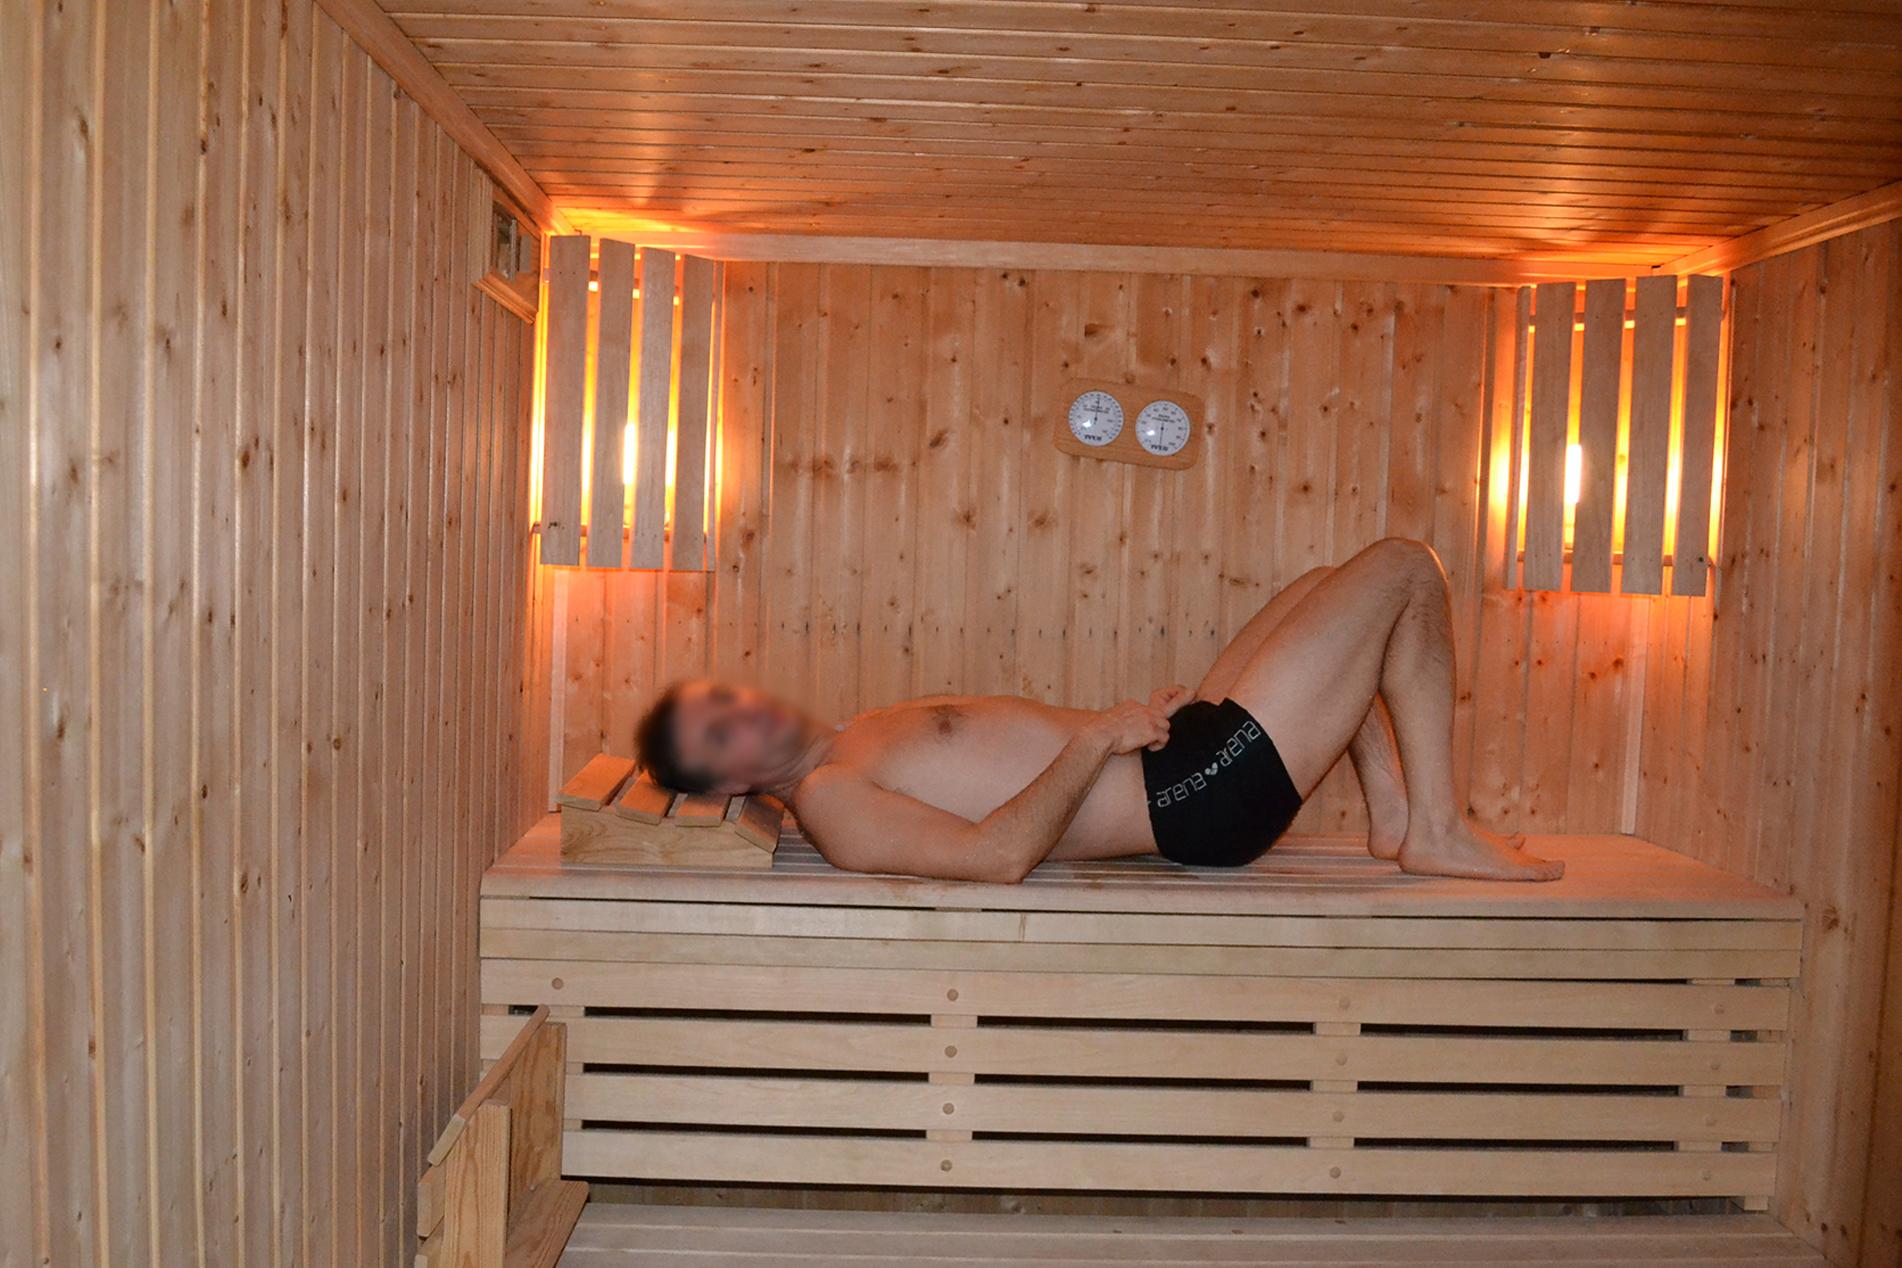 Espace bien tre hammam sauna location lac du der for Espace sauna hammam